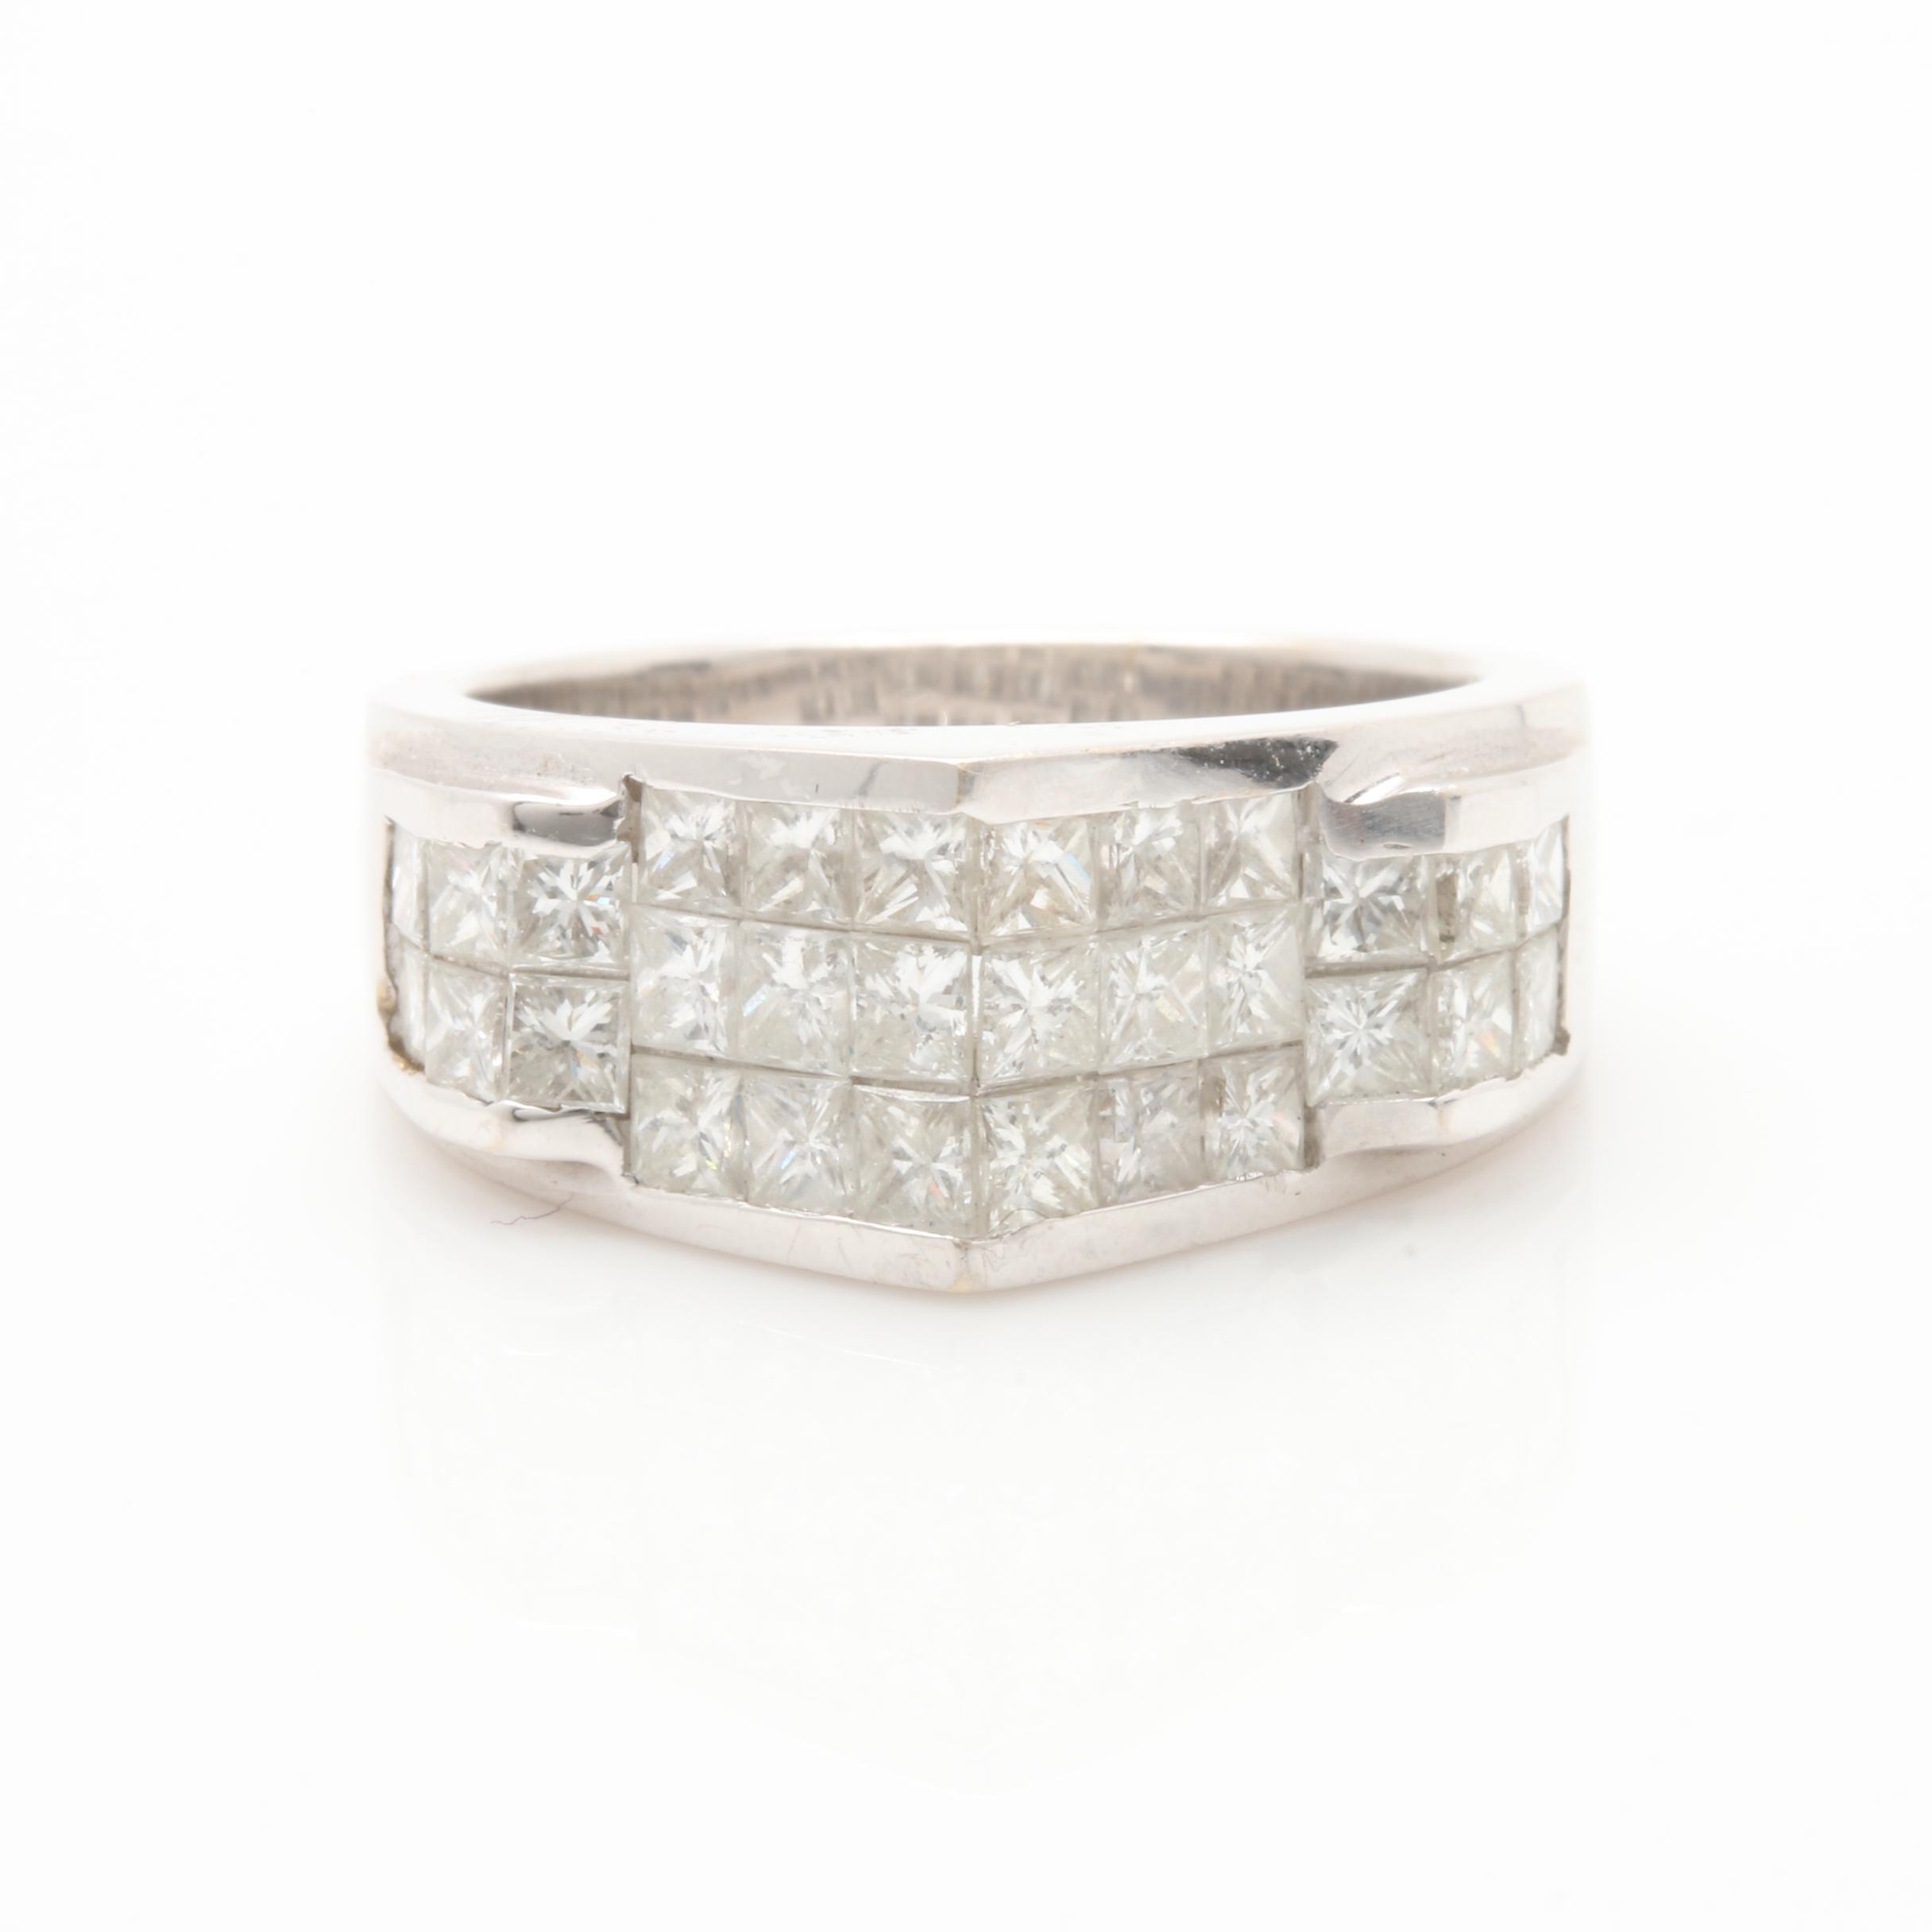 18K White Gold 2.10 CTW Diamond Ring